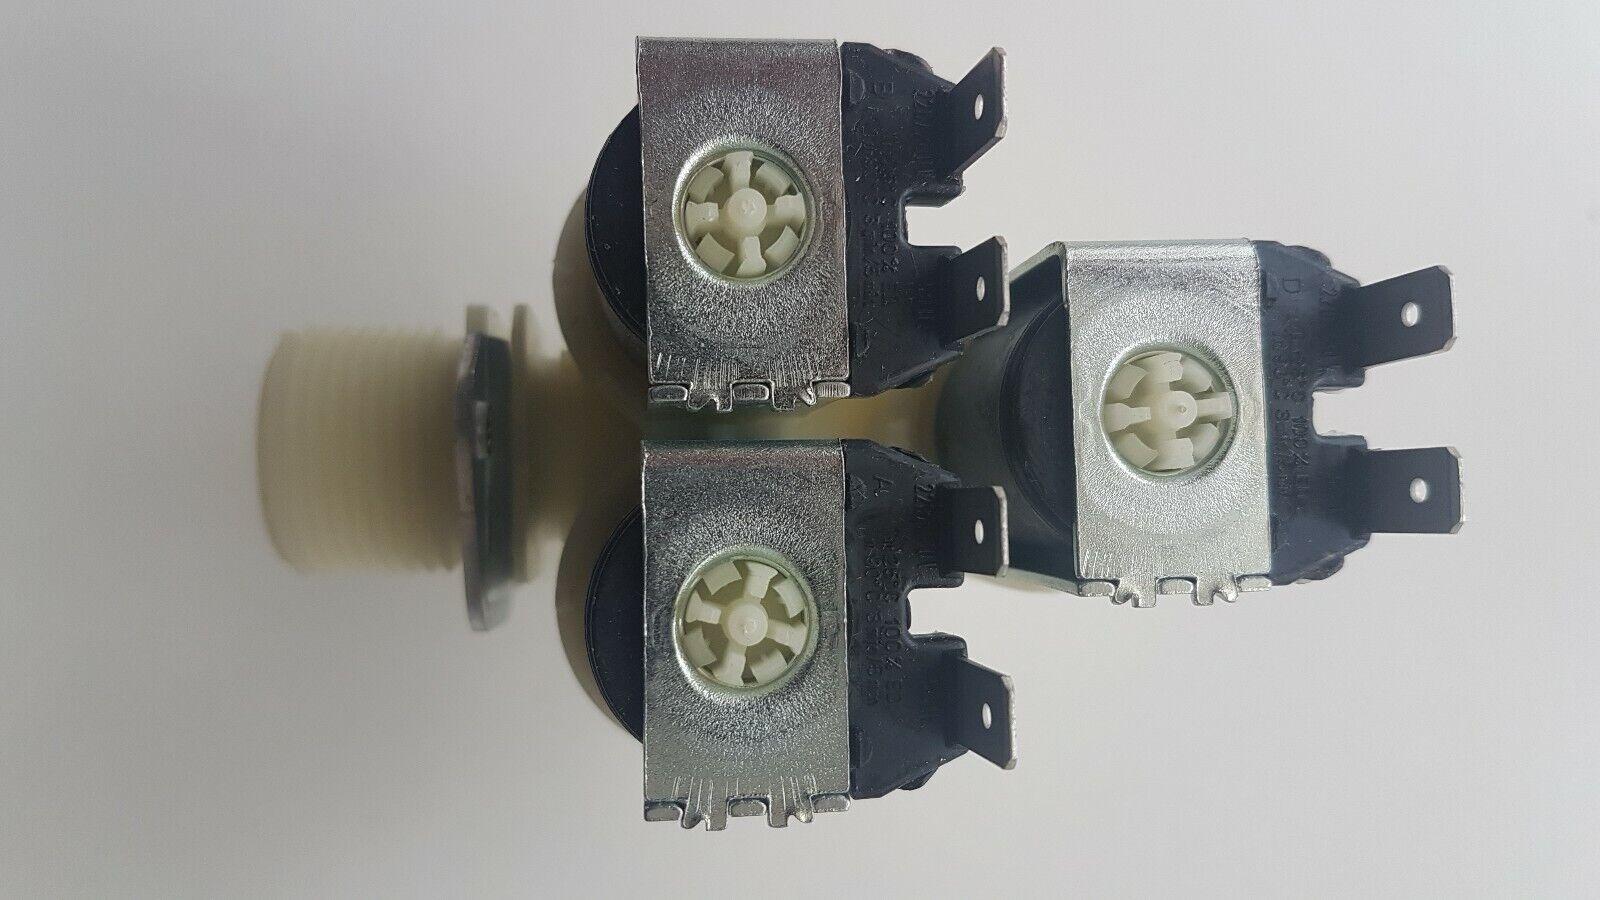 ORIGINAL Magnetventil Ventil 1-fach 180° 10,5mm Waschmaschine Miele 4971731